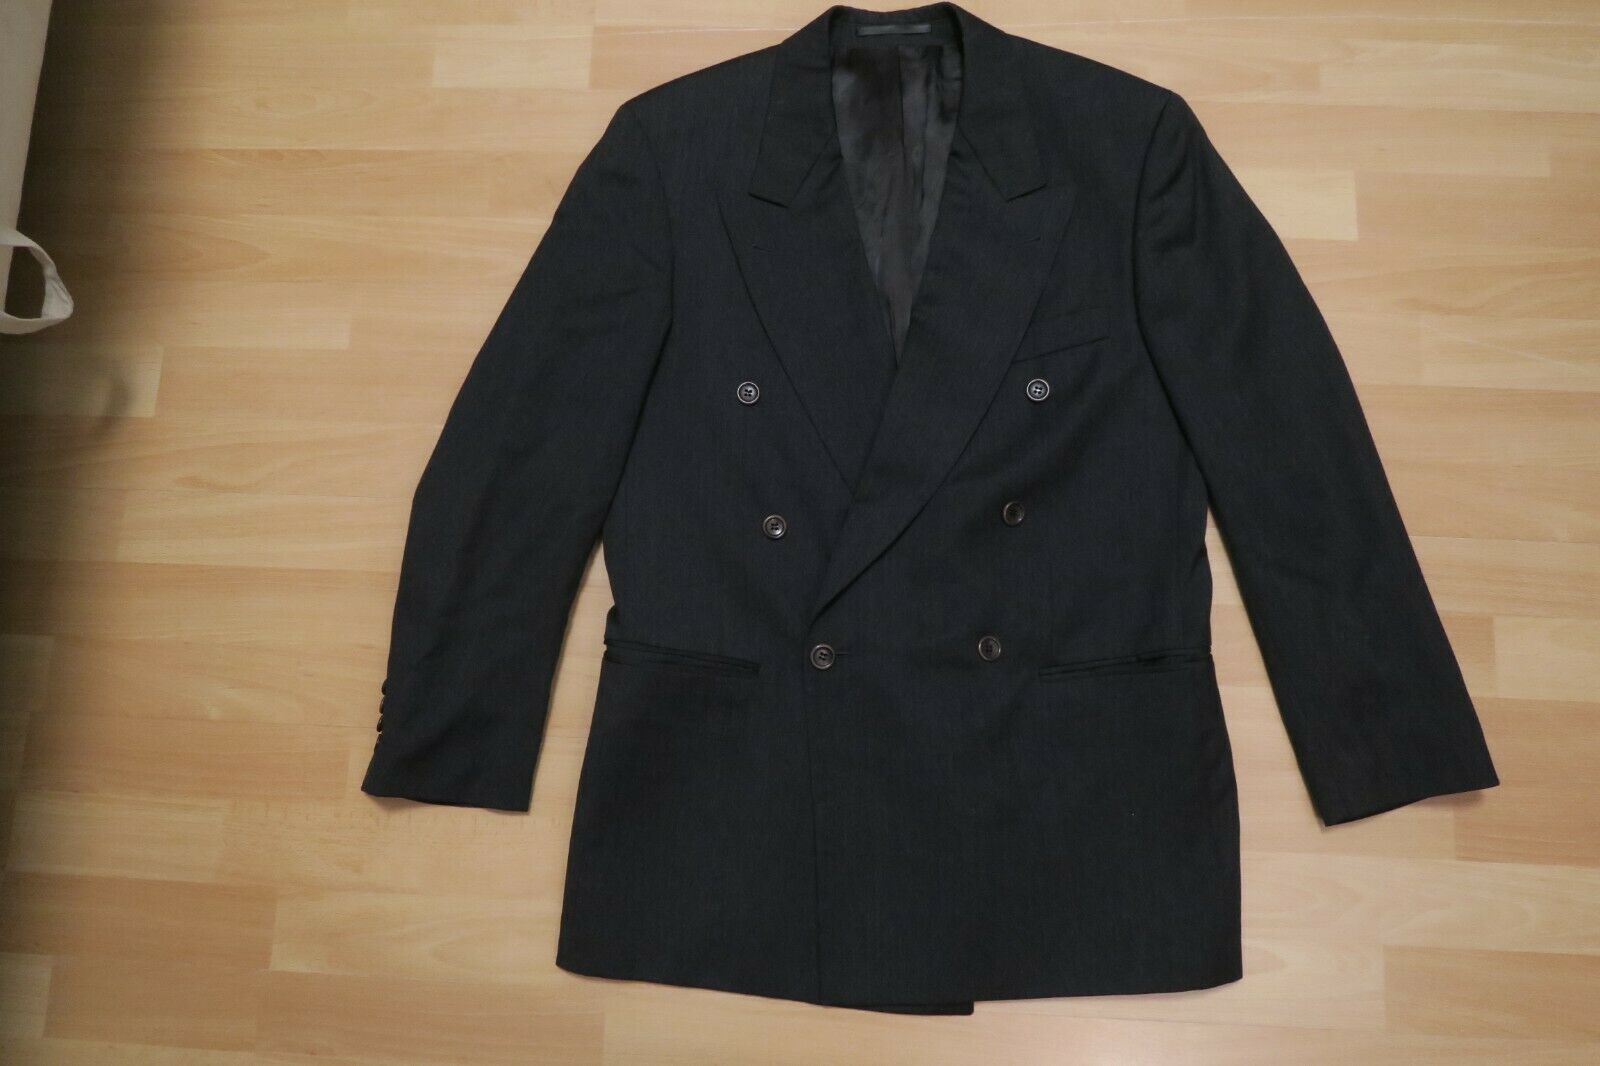 HUGO BOSS Sakko w.NEU  S 48 100%Wolle grau Jacke ZEUS AKROPOLIS Herren Anzug